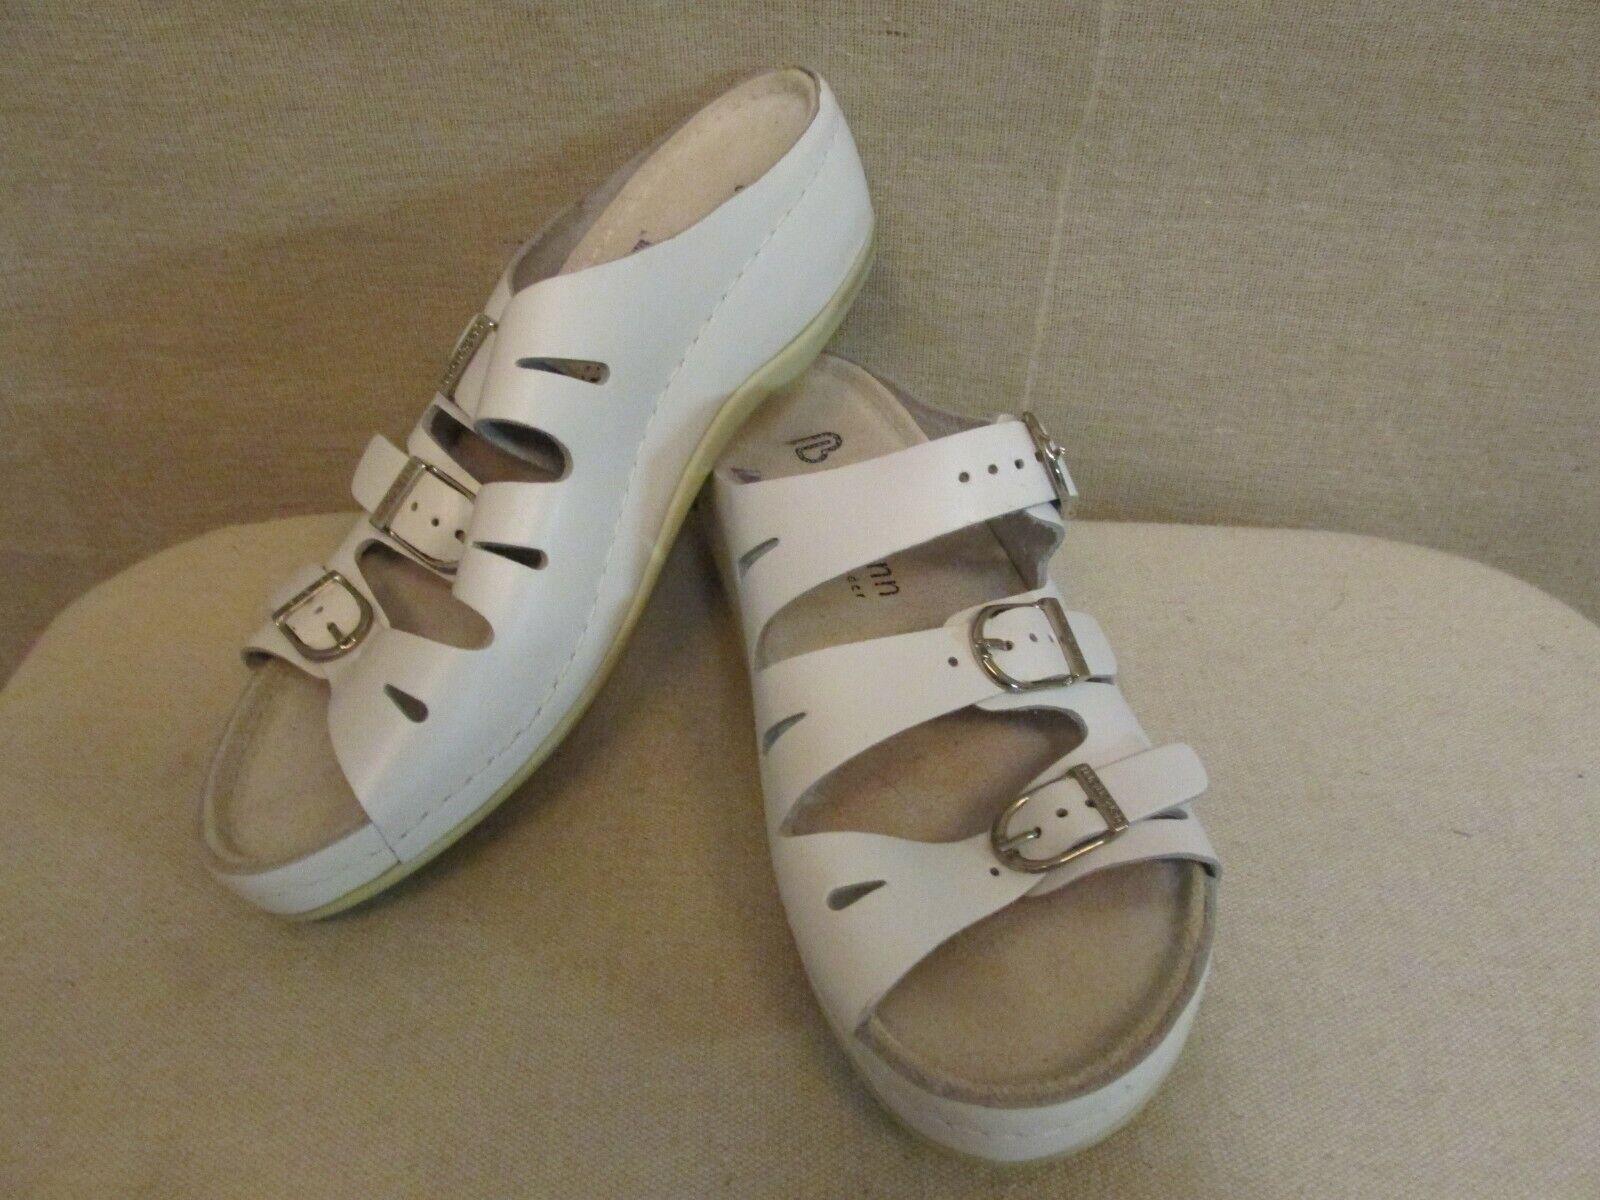 26d4672cbb15a Berkemann White Leather Buckle Sandals shoes US 6.5 UK 4 EU 37 ...